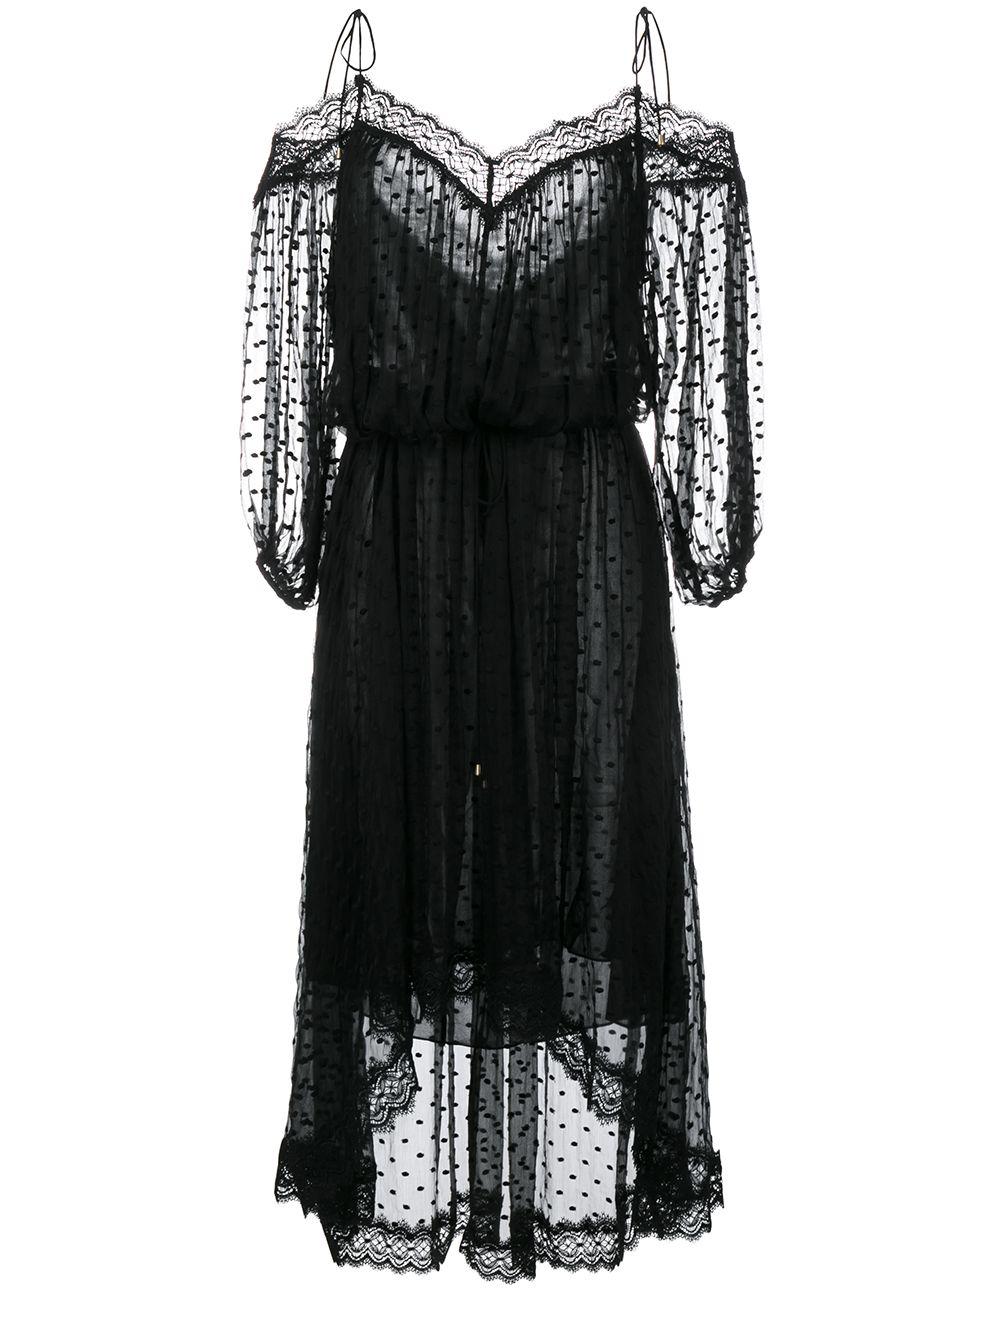 Realm Scallop Silk Off-Shoulder Dress | Zimmermann | Pinterest